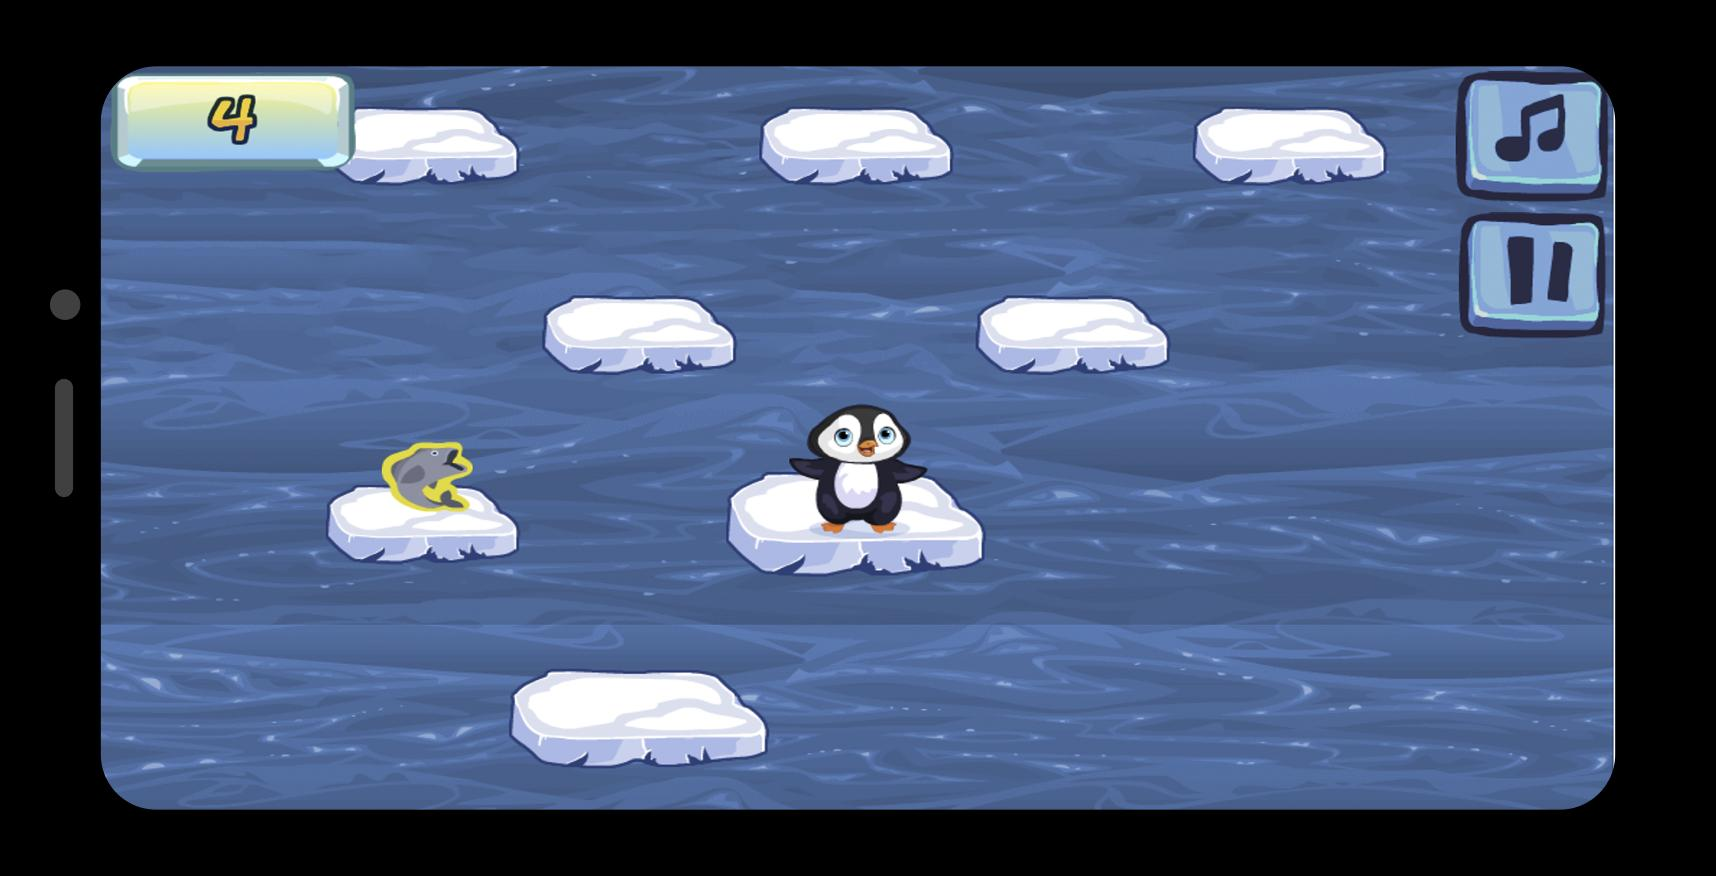 100 in 1 Games 3.3 Screenshot 3